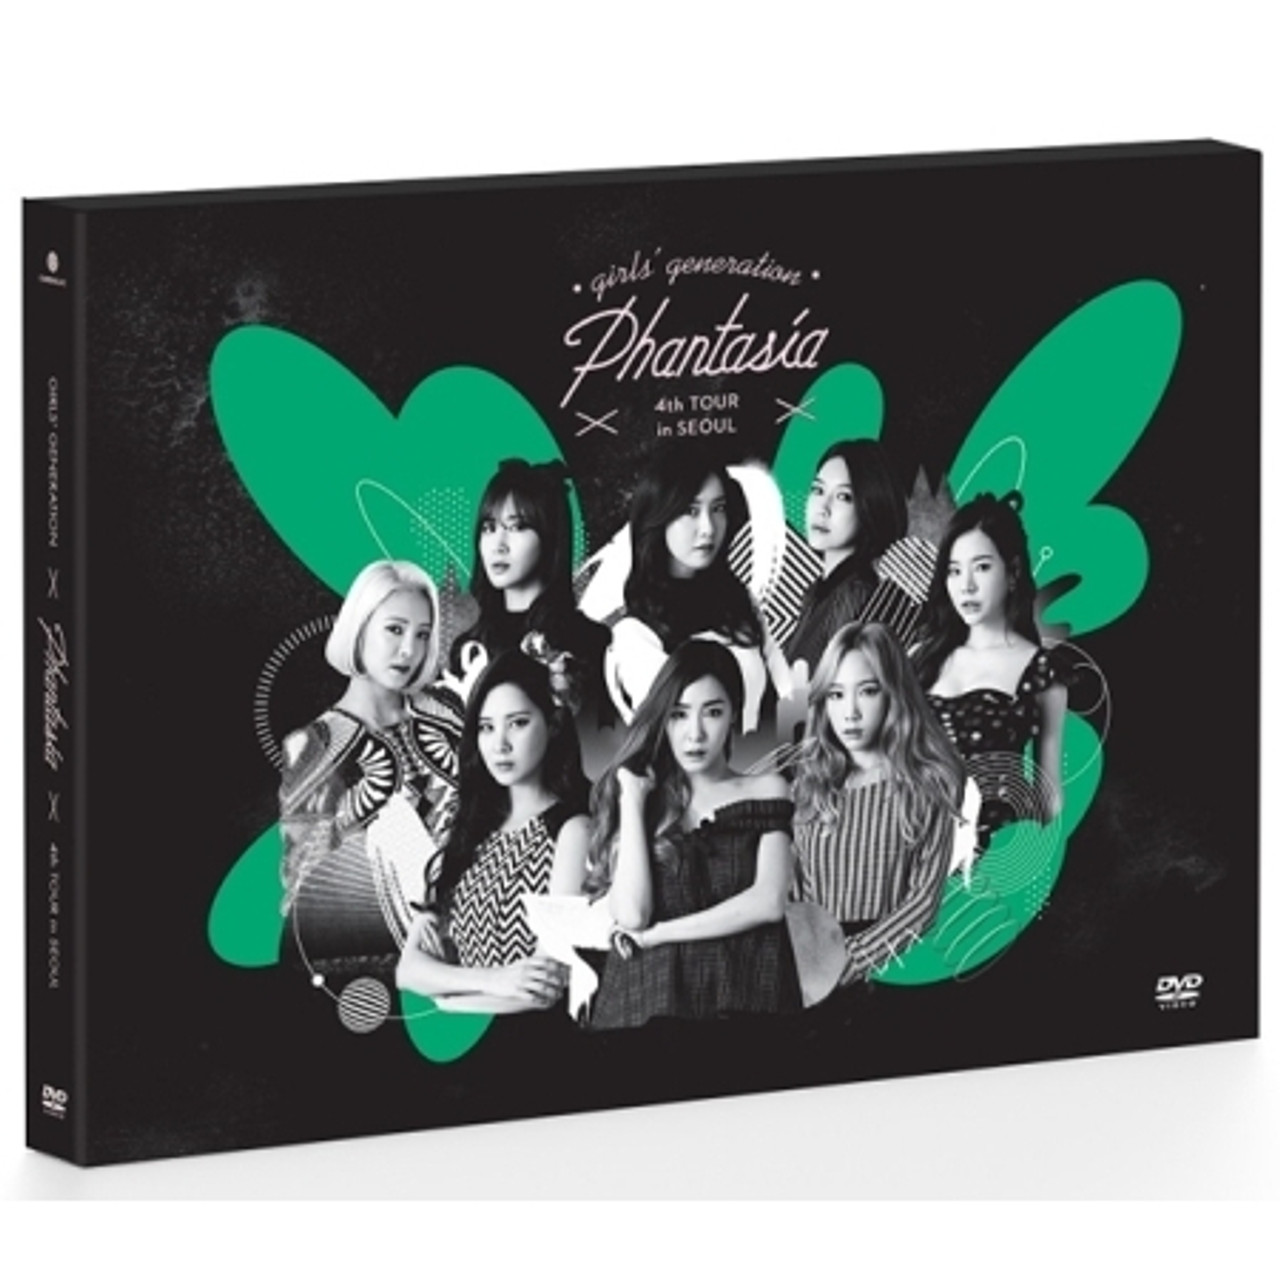 Girls Generation - 4th Concert [PHANTASIA] IN SEOUL DVD (2 DISC)